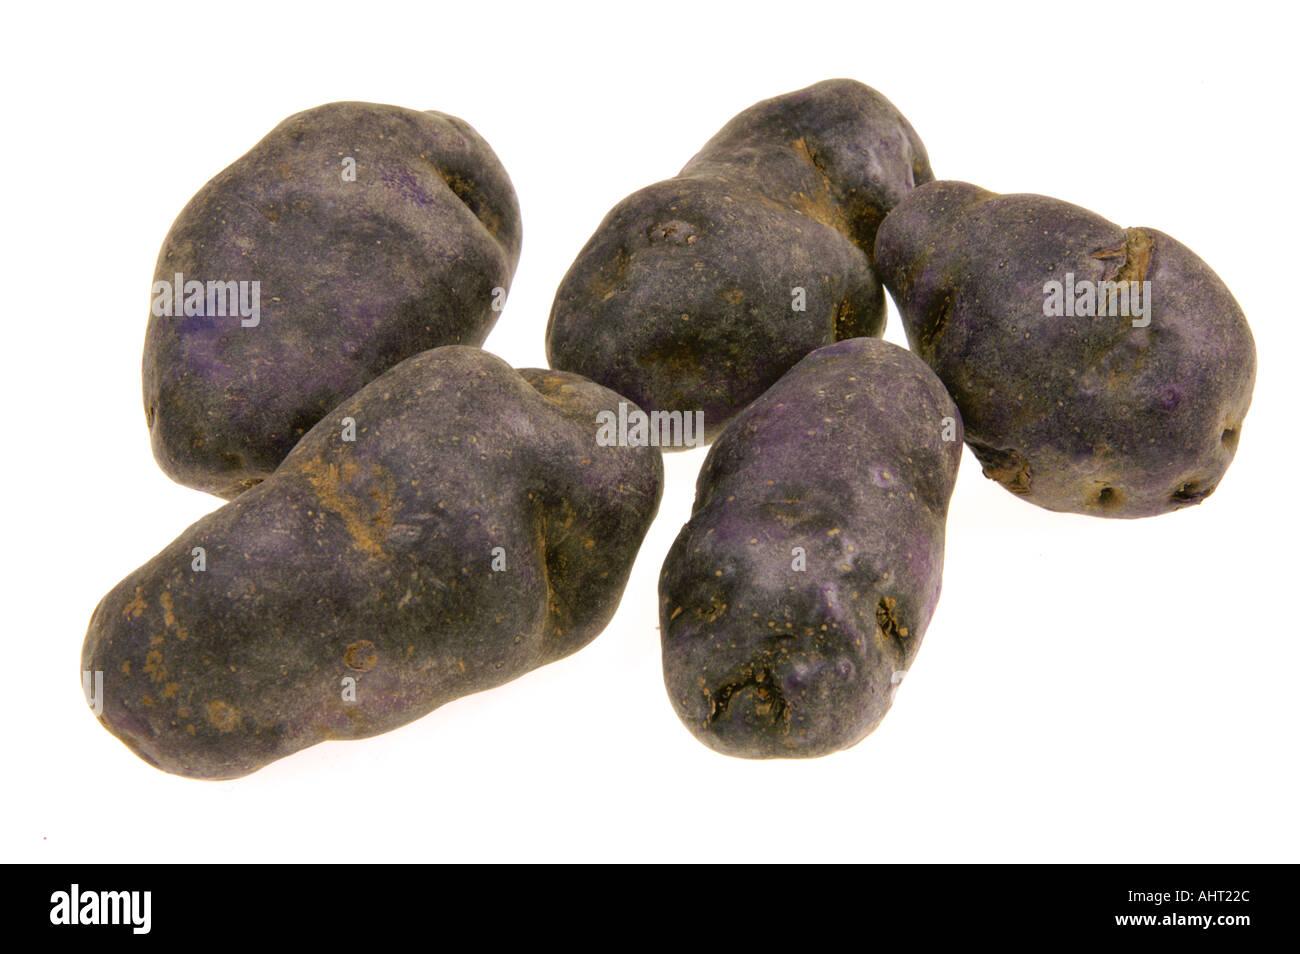 new sort of potatoes BLUE POTATO french of france special kind black   violett noire black - Stock Image